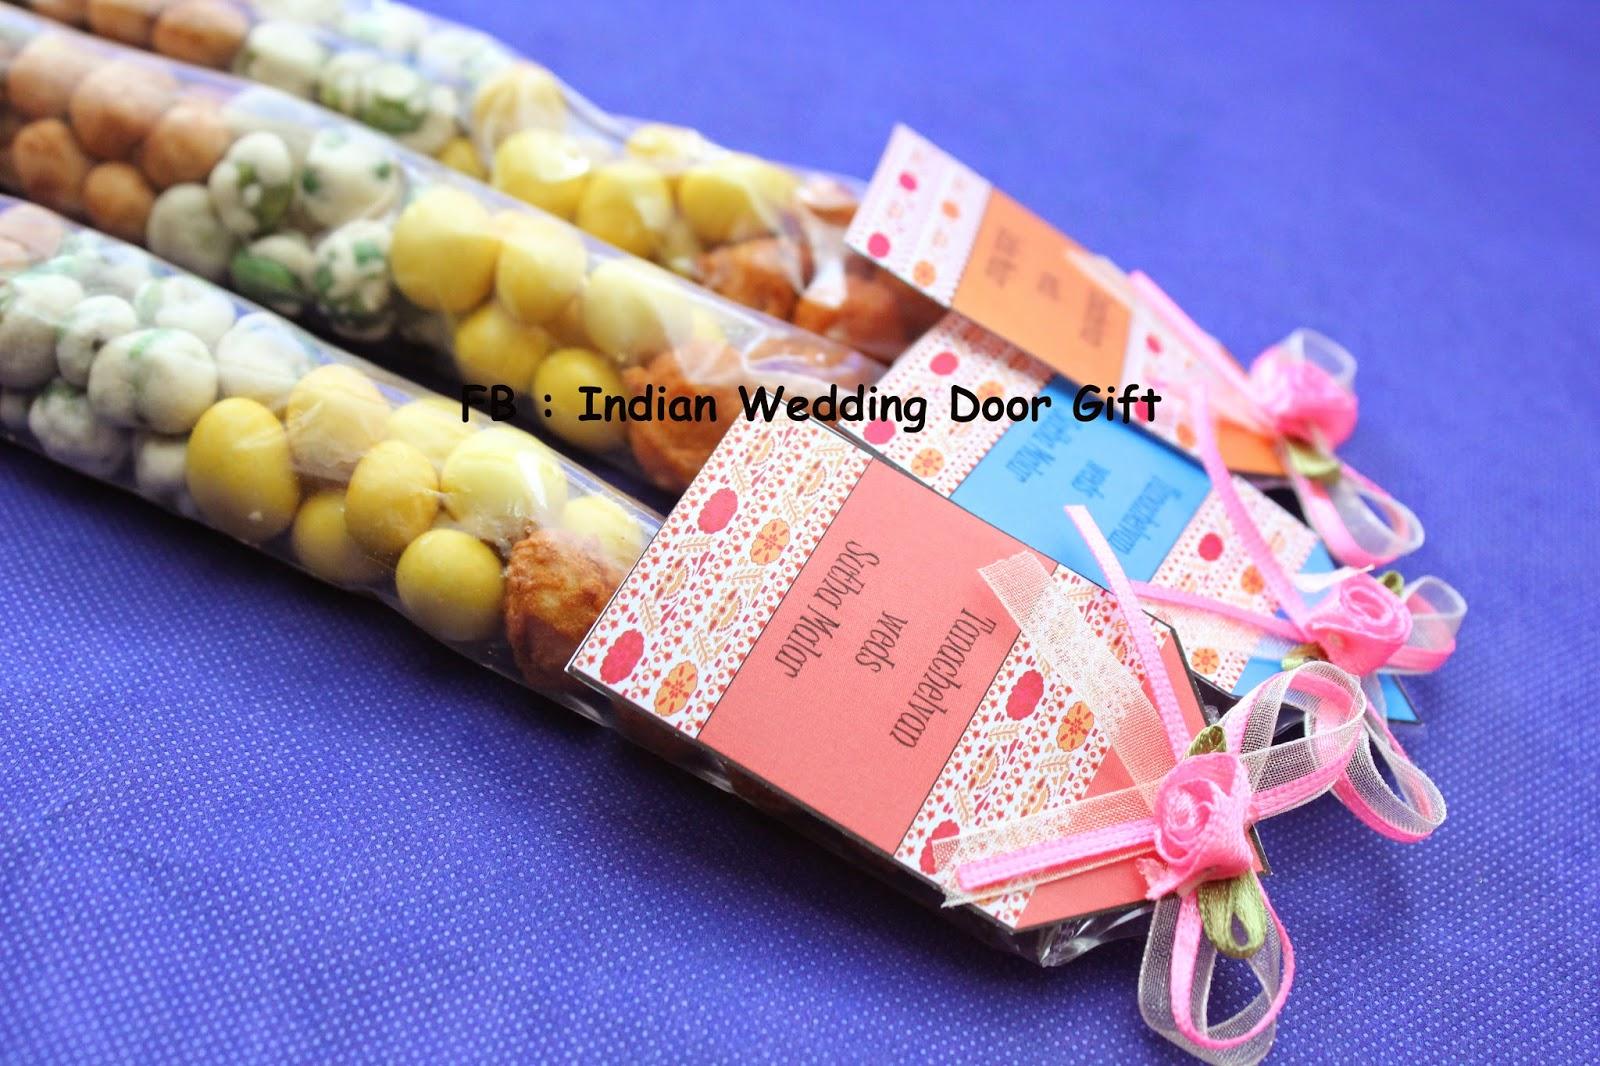 Indian Wedding Door Gift: Mixed Nuts in Packet (Indian Kacang Putih)